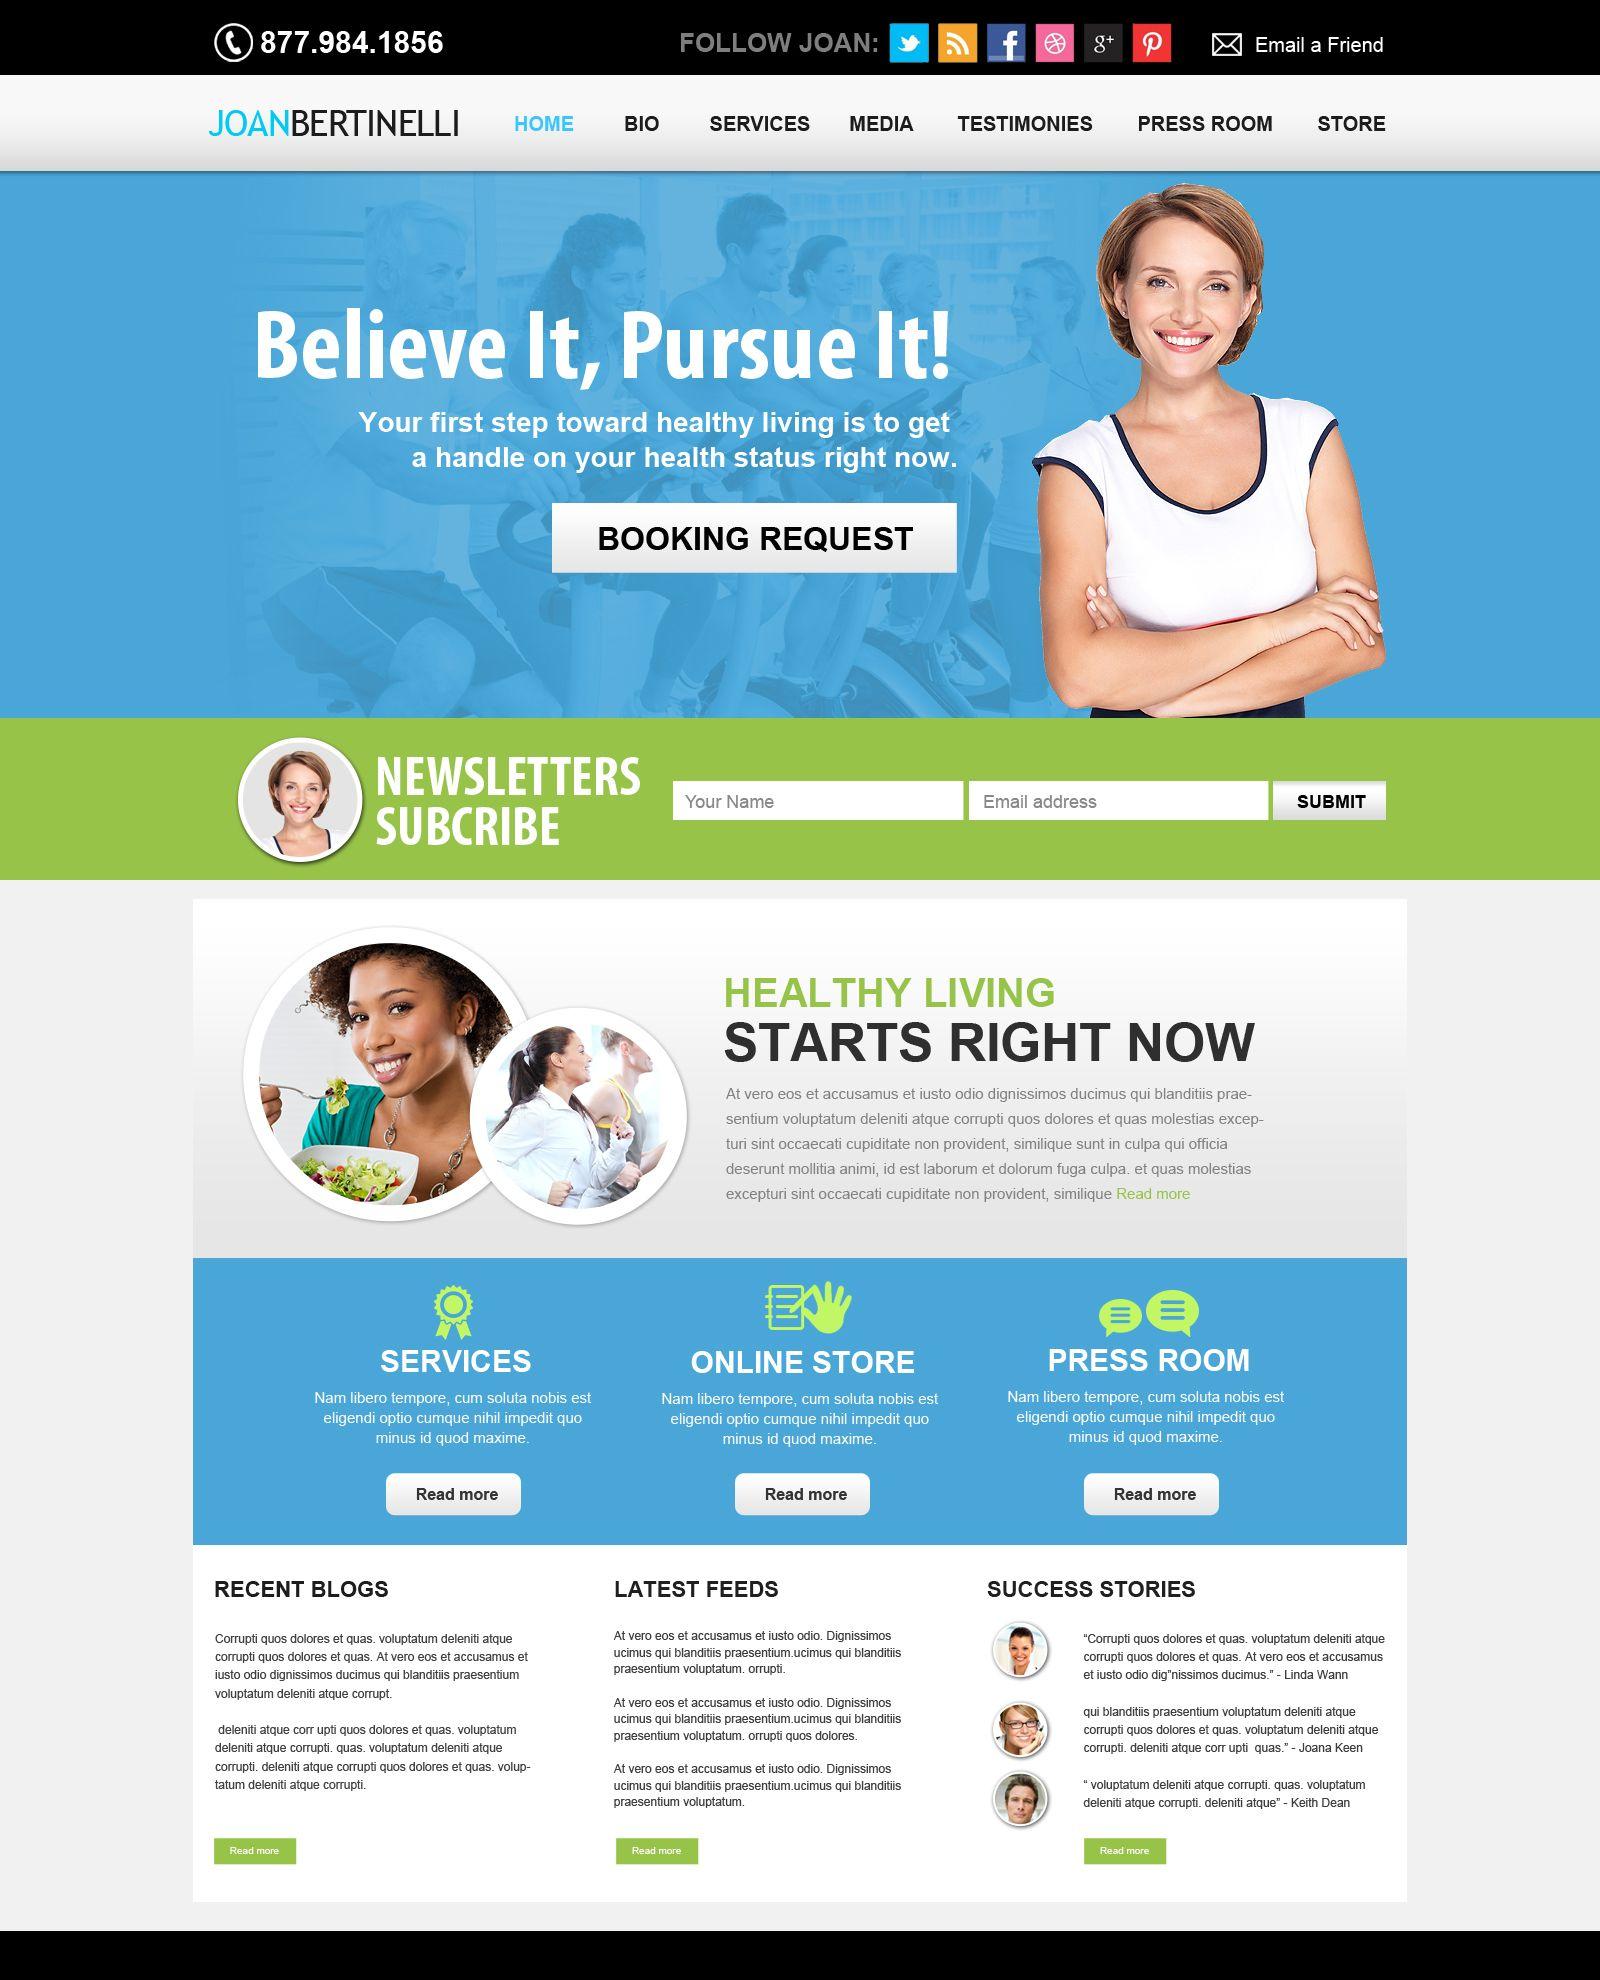 Health and Fitness Website. Nutritionist website, wellness